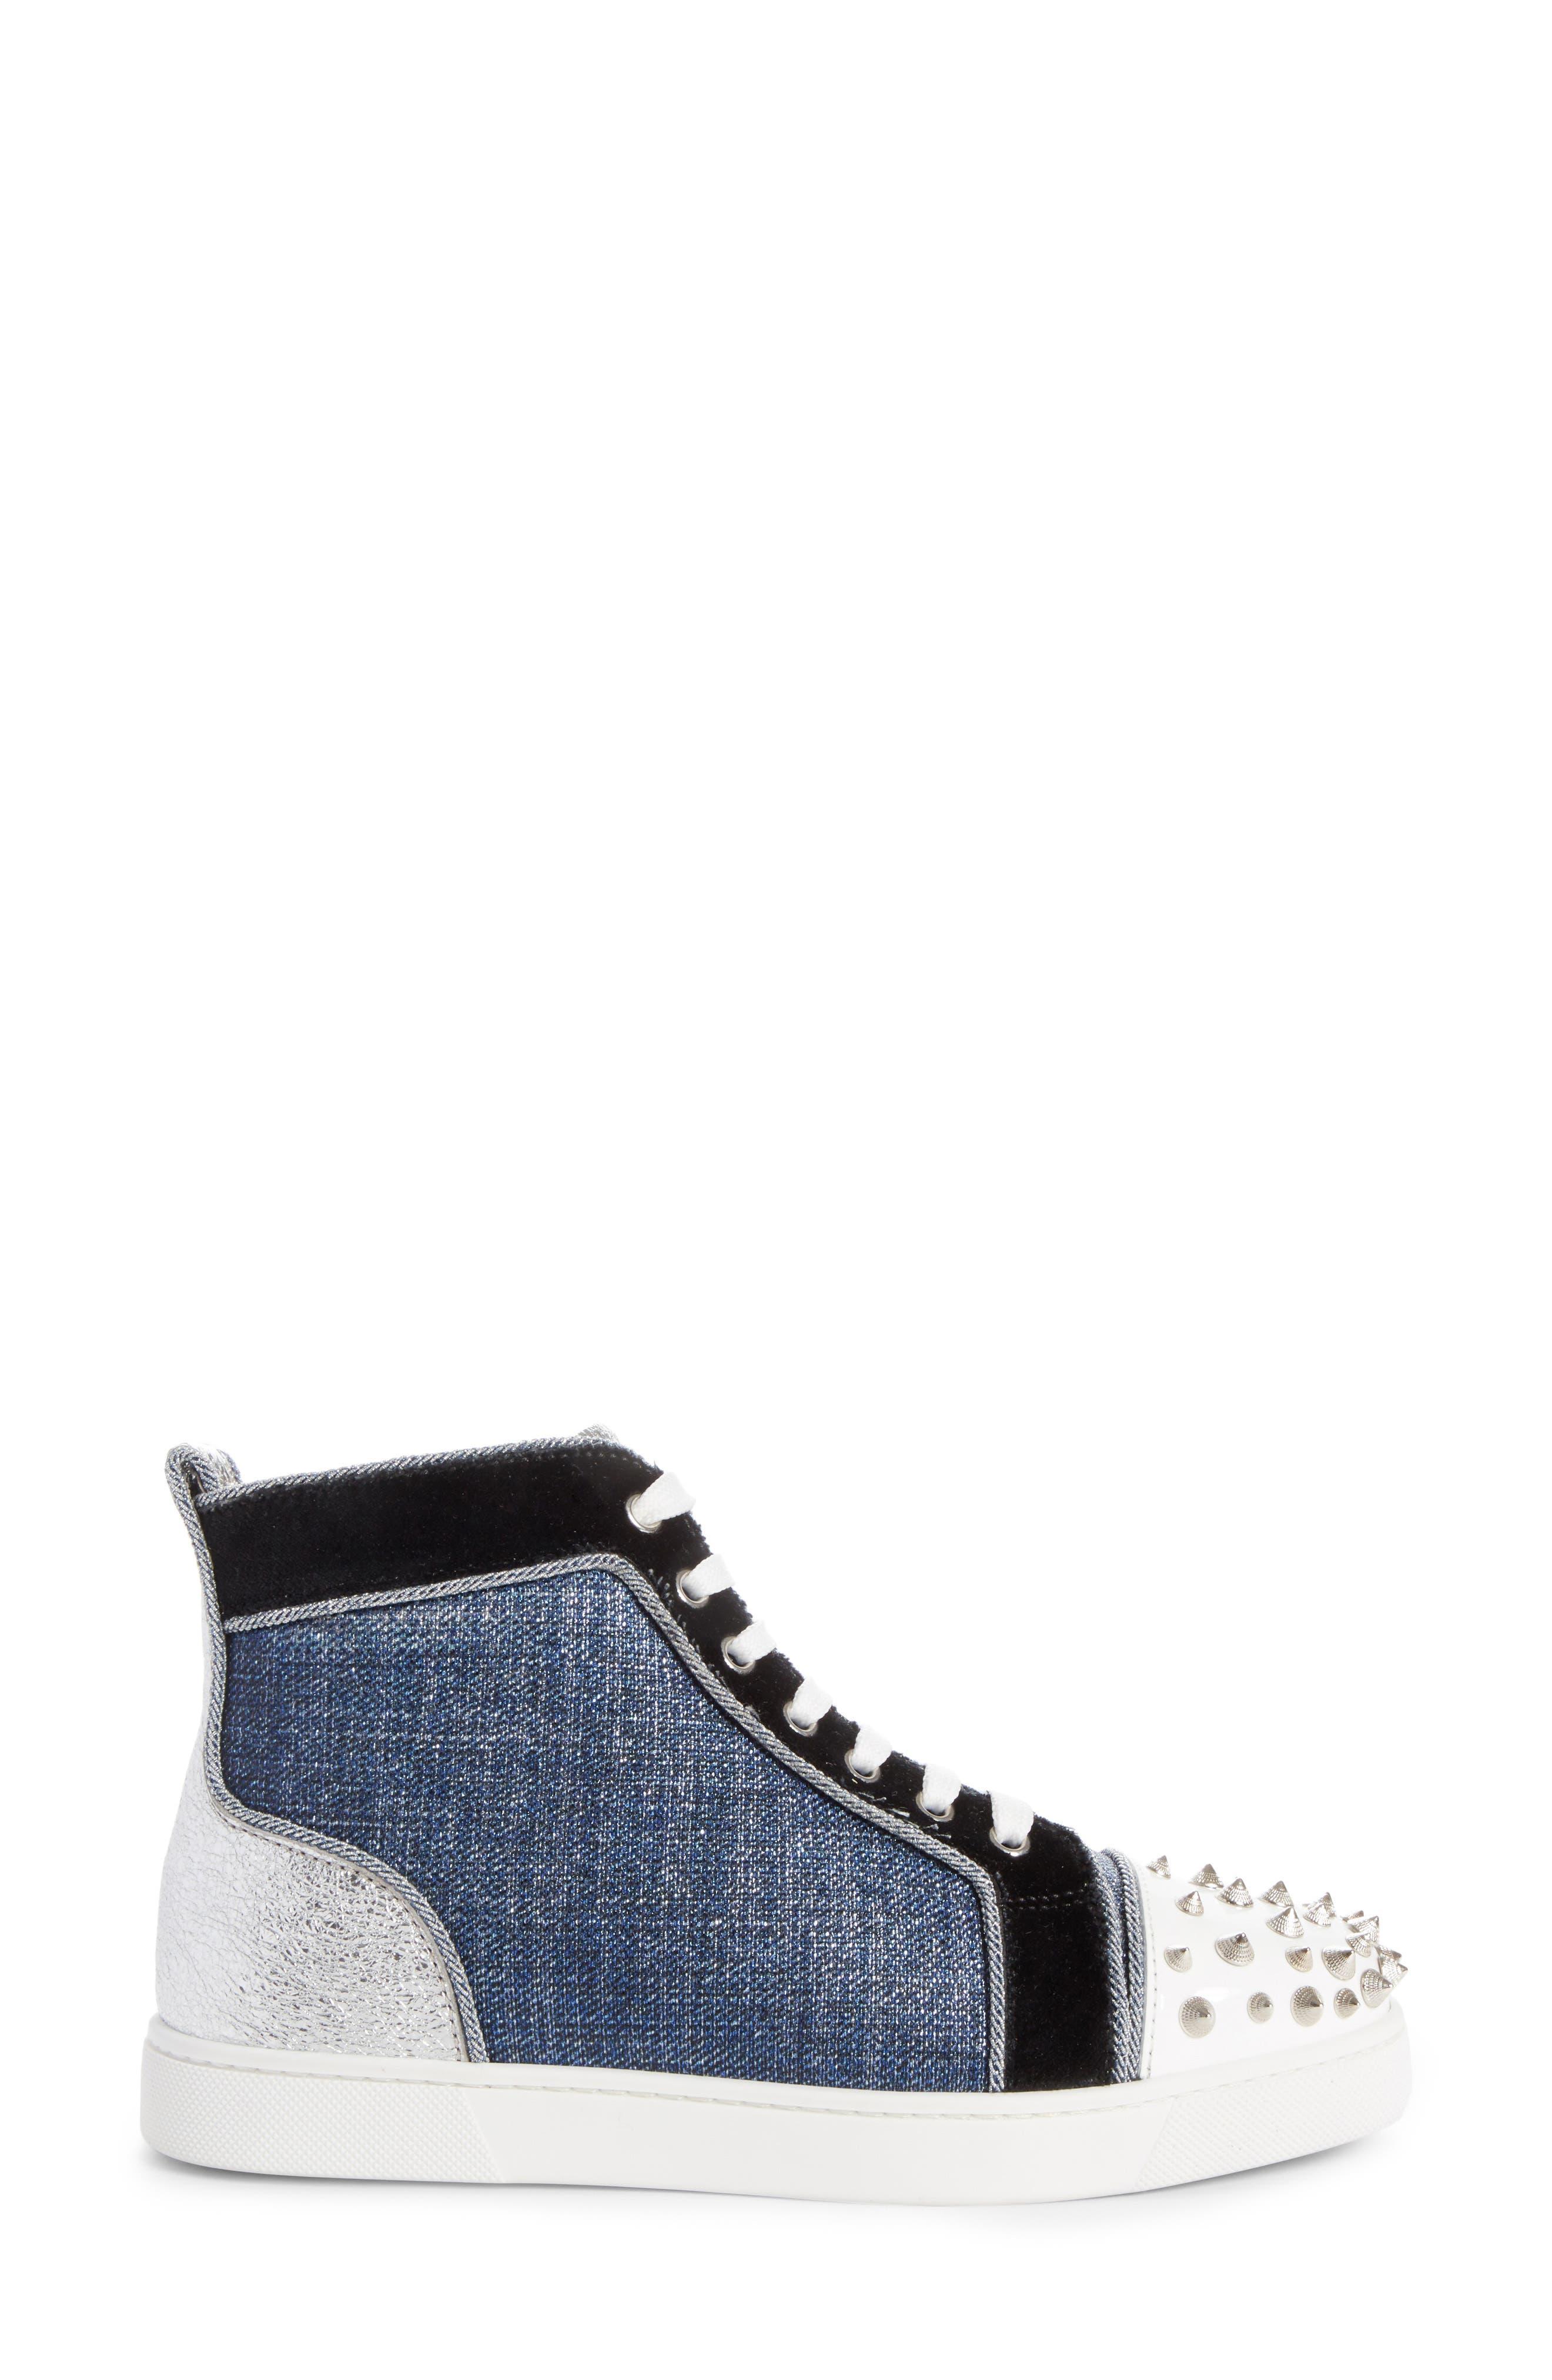 Lou Degra Spiked High Top Sneaker,                             Alternate thumbnail 3, color,                             Denim/ Silver